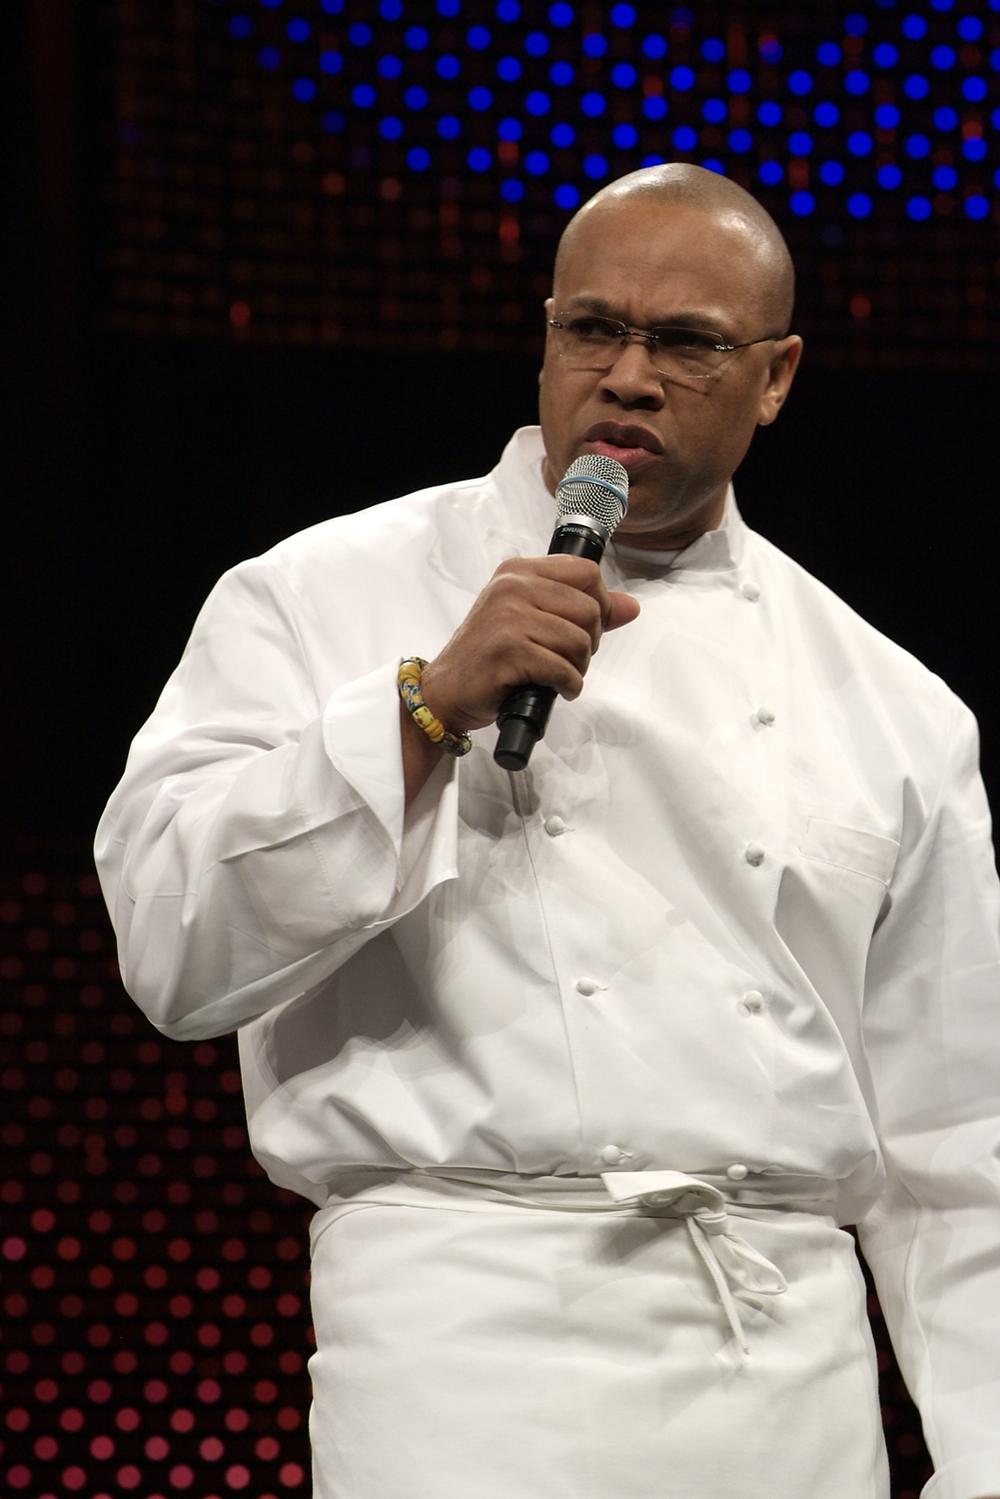 Chef Jeff